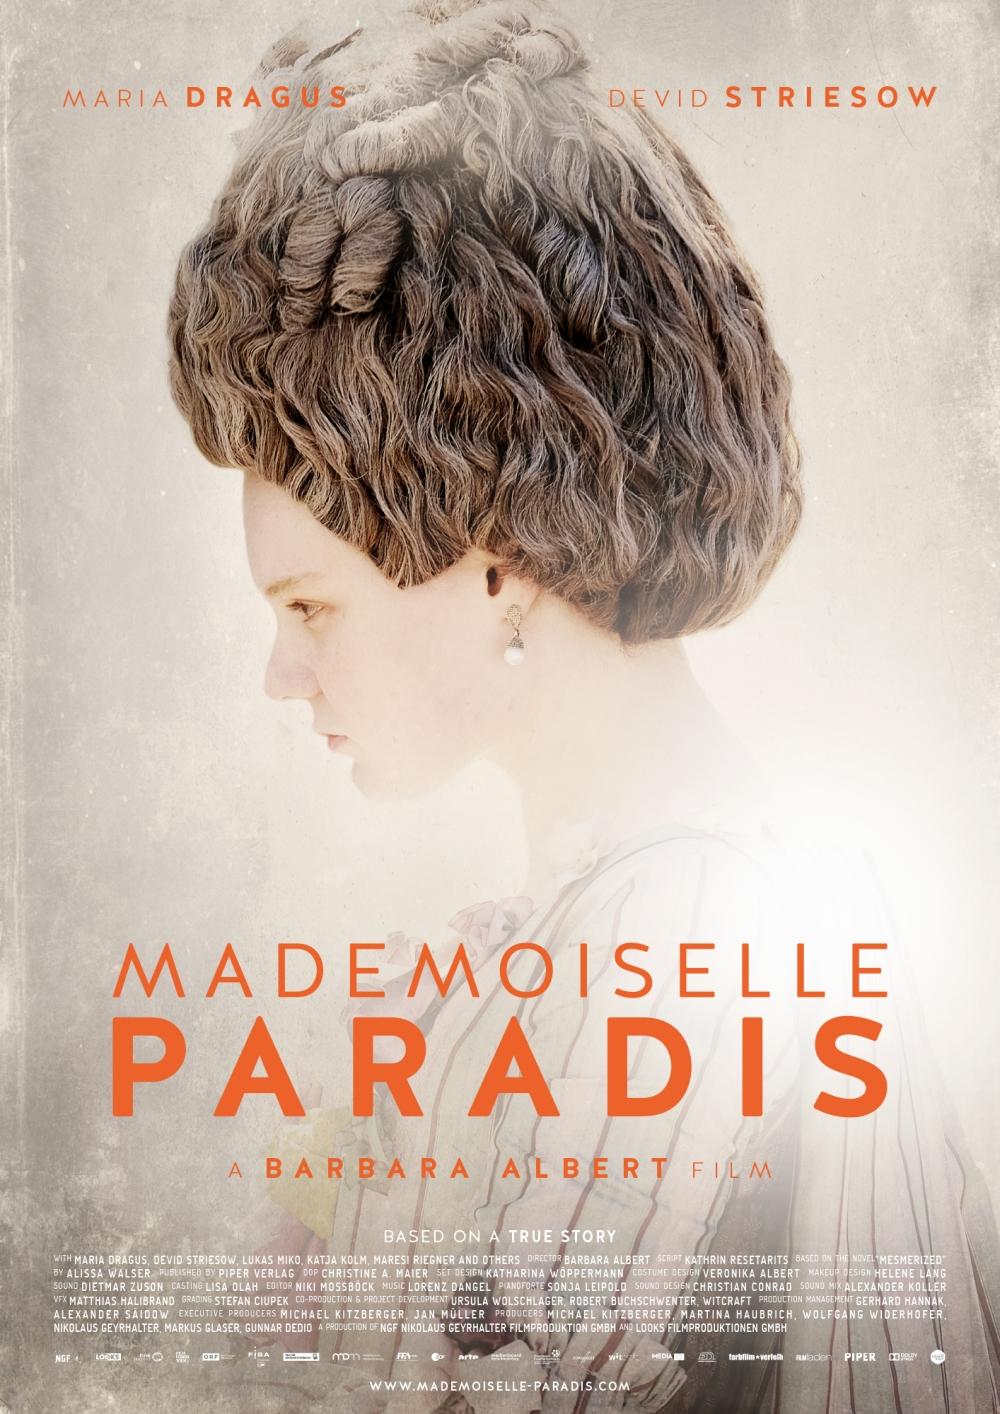 mademoiselle paradis poster.jpg